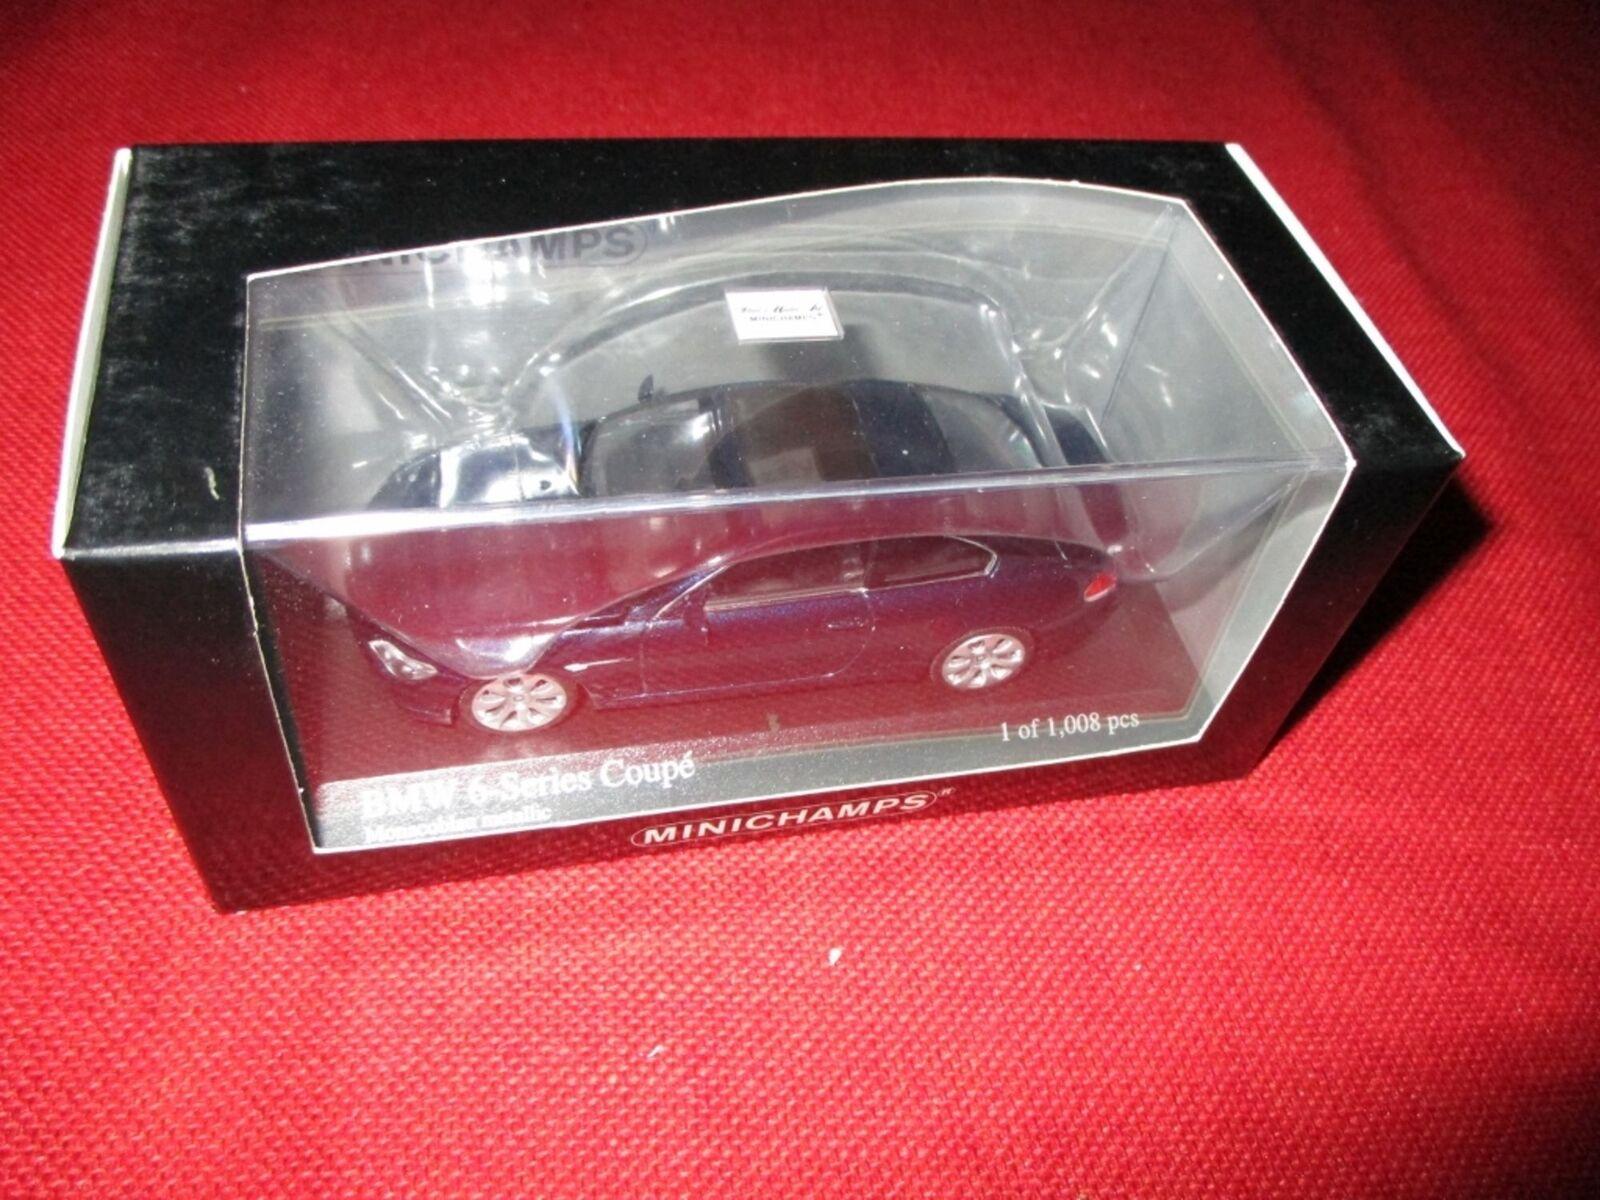 Minichamps ® 431 026021 1 43 BMW 6-Series Coupe 2006 BLU NUOVO OVP